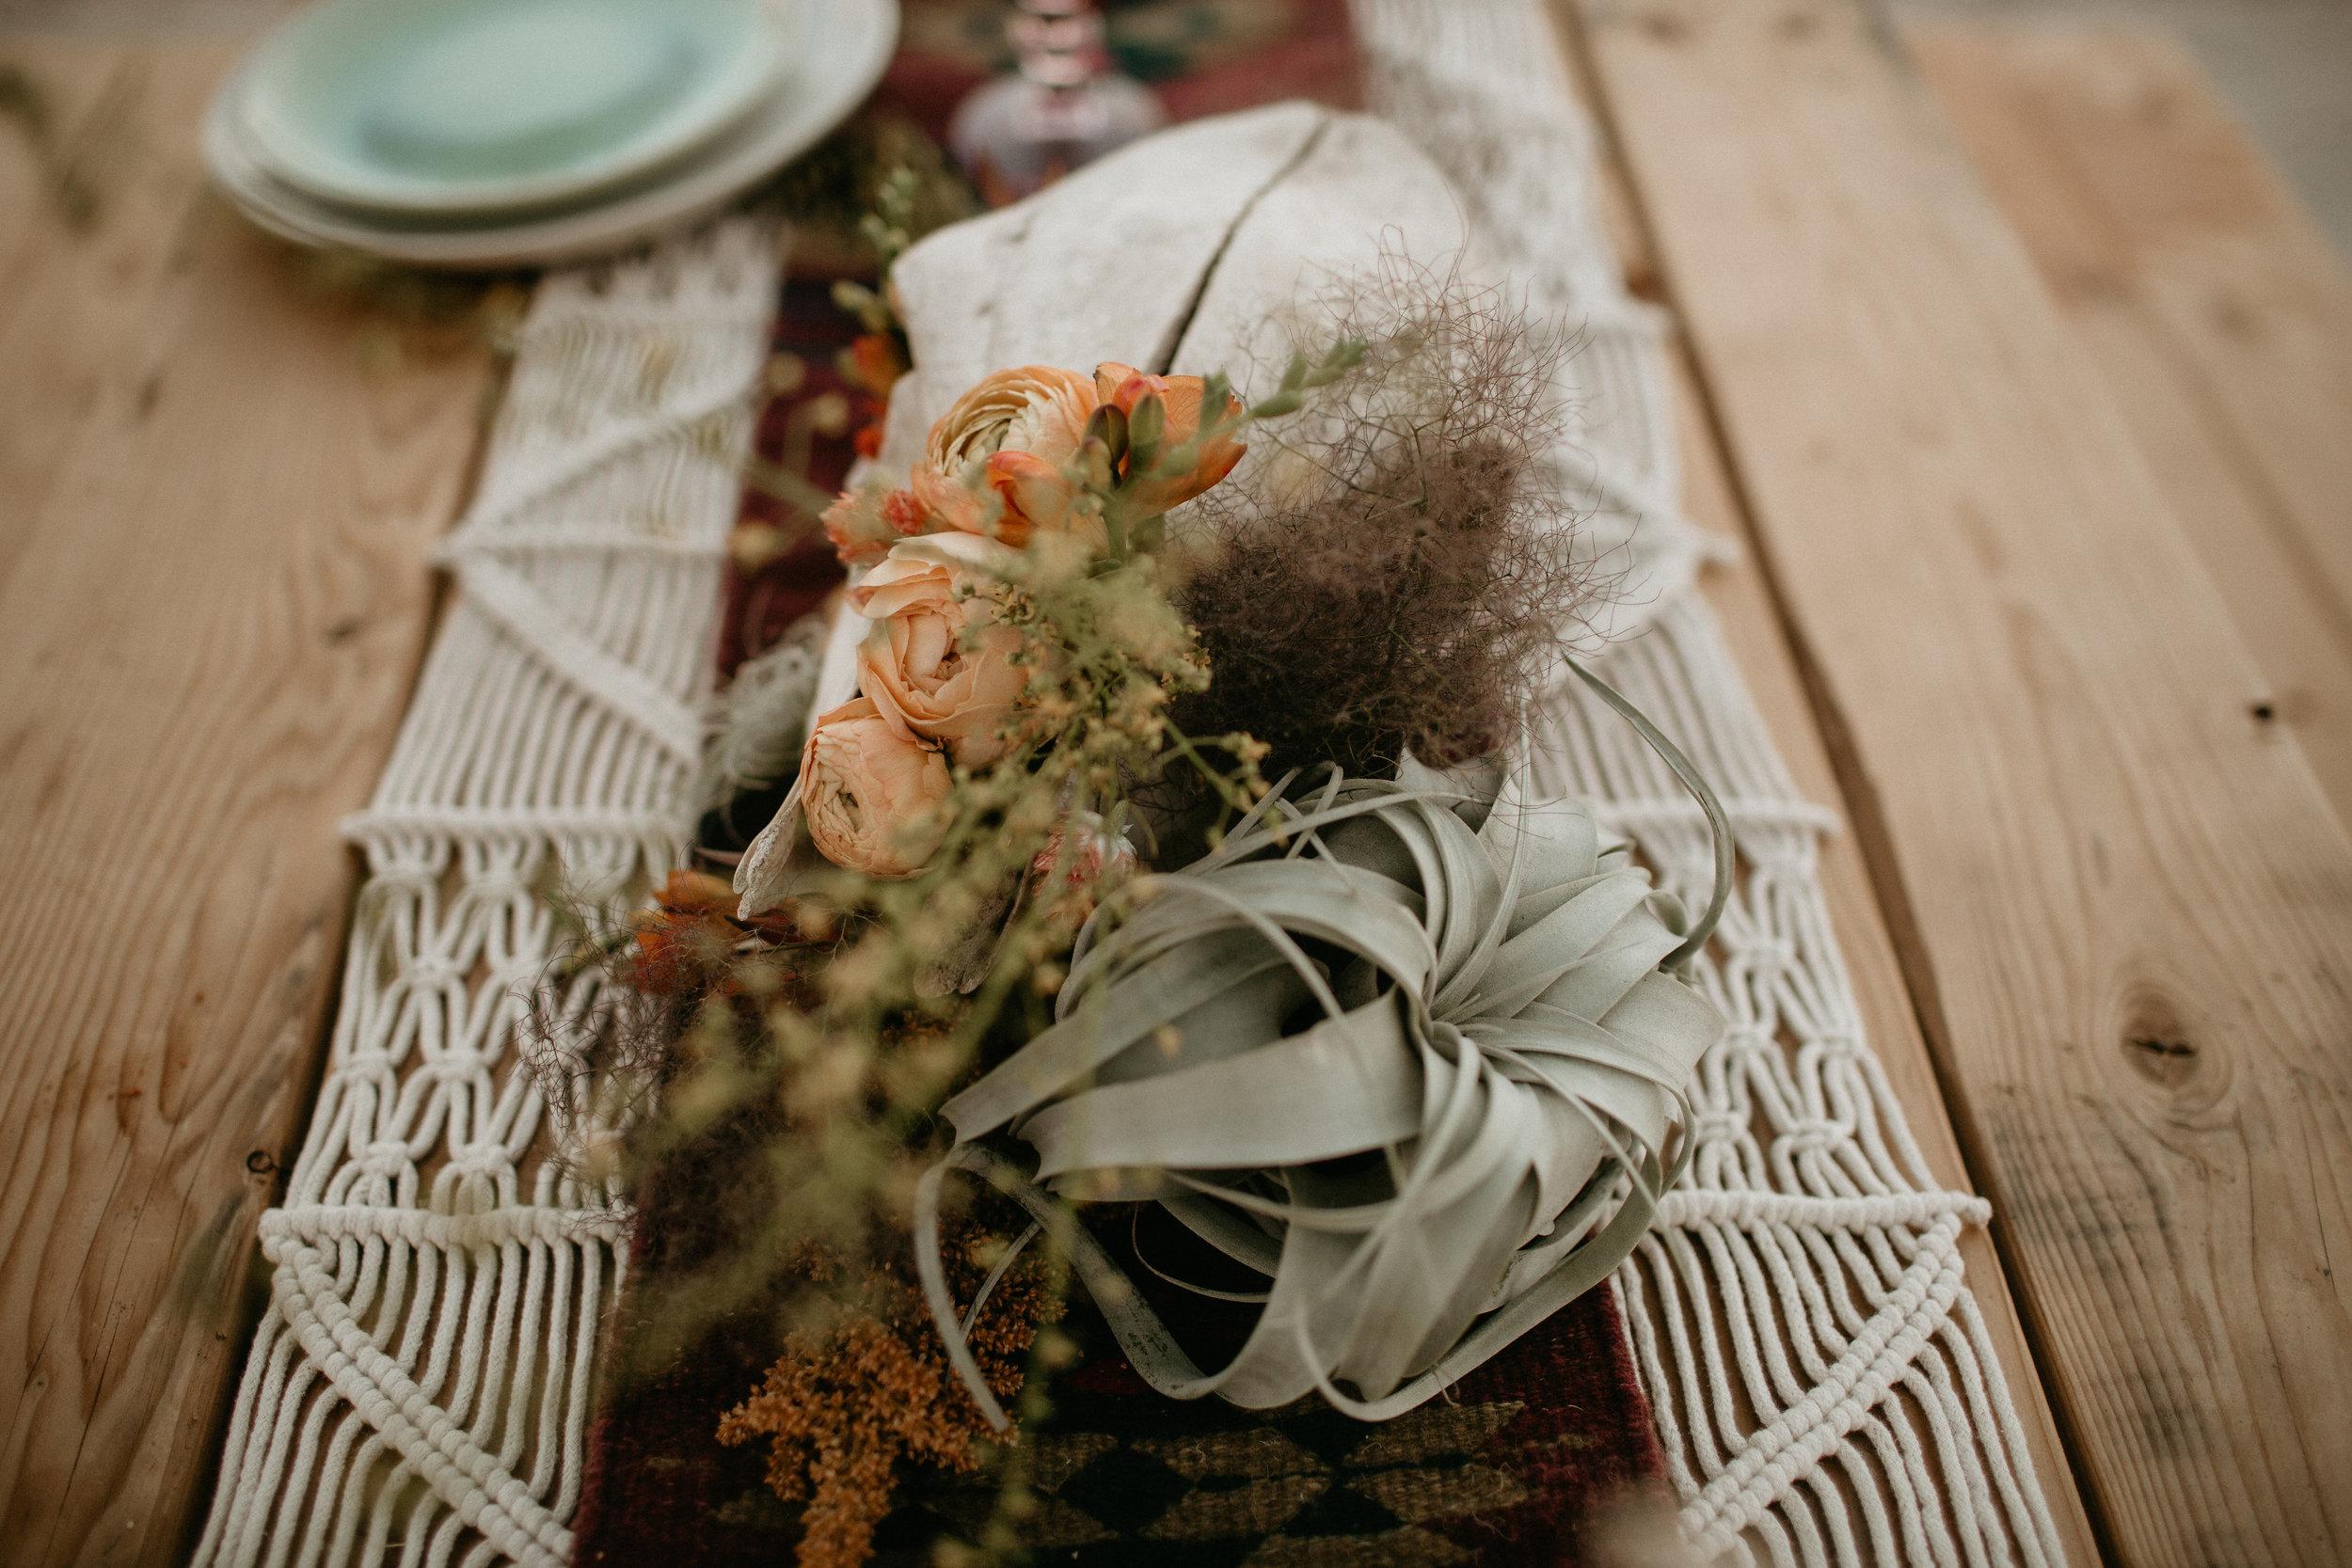 airplant centerpiece for desert wedding by Pasadena florist #lrqcfloral